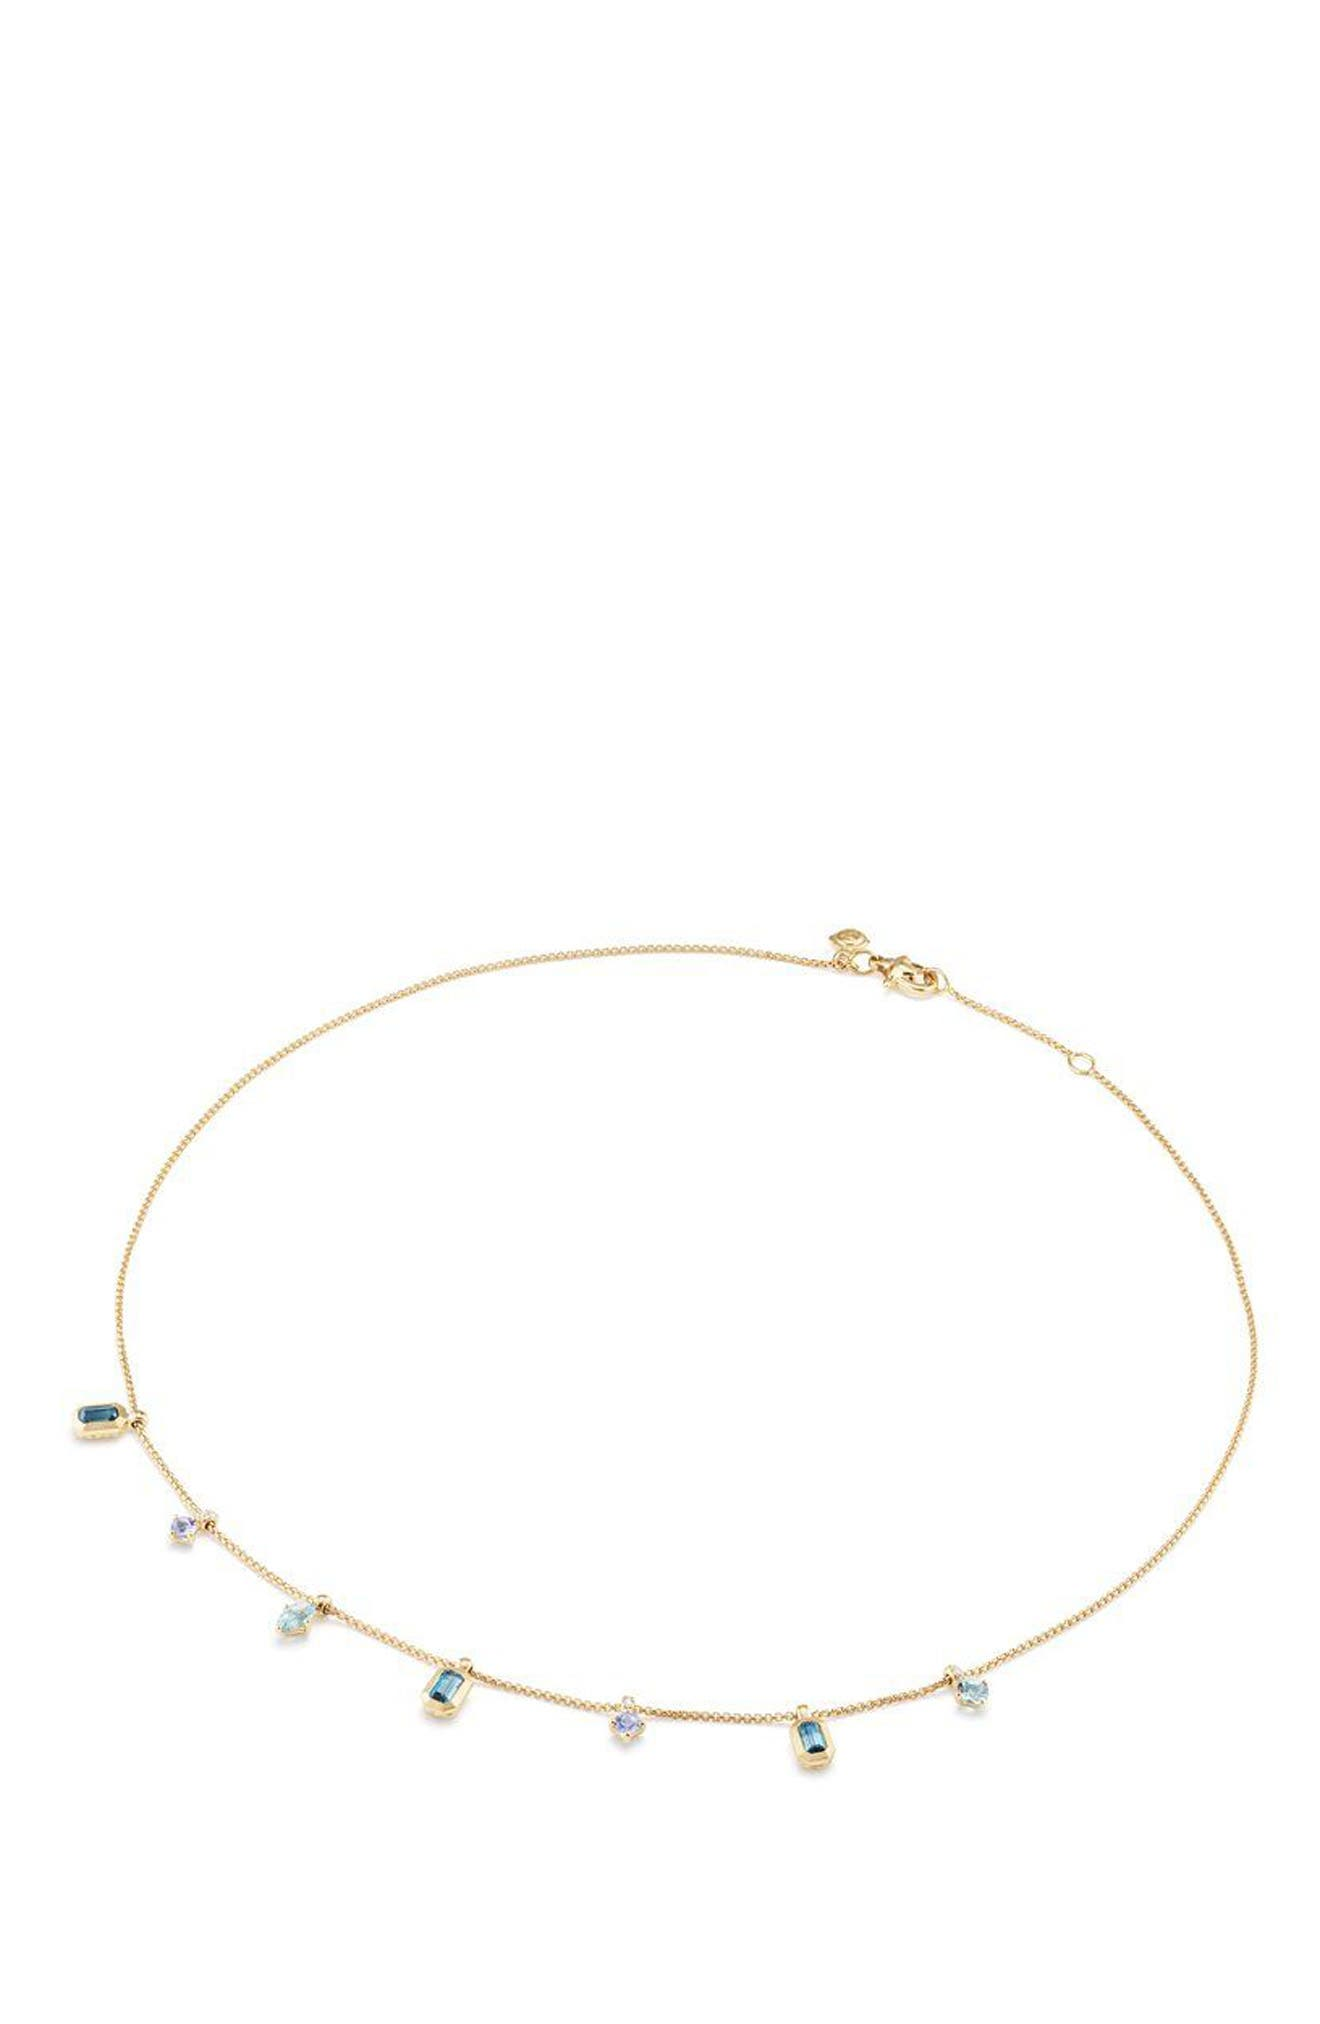 Novella Necklace in 18K Gold,                             Alternate thumbnail 2, color,                             Gold/ Diamond/ Blue Topaz